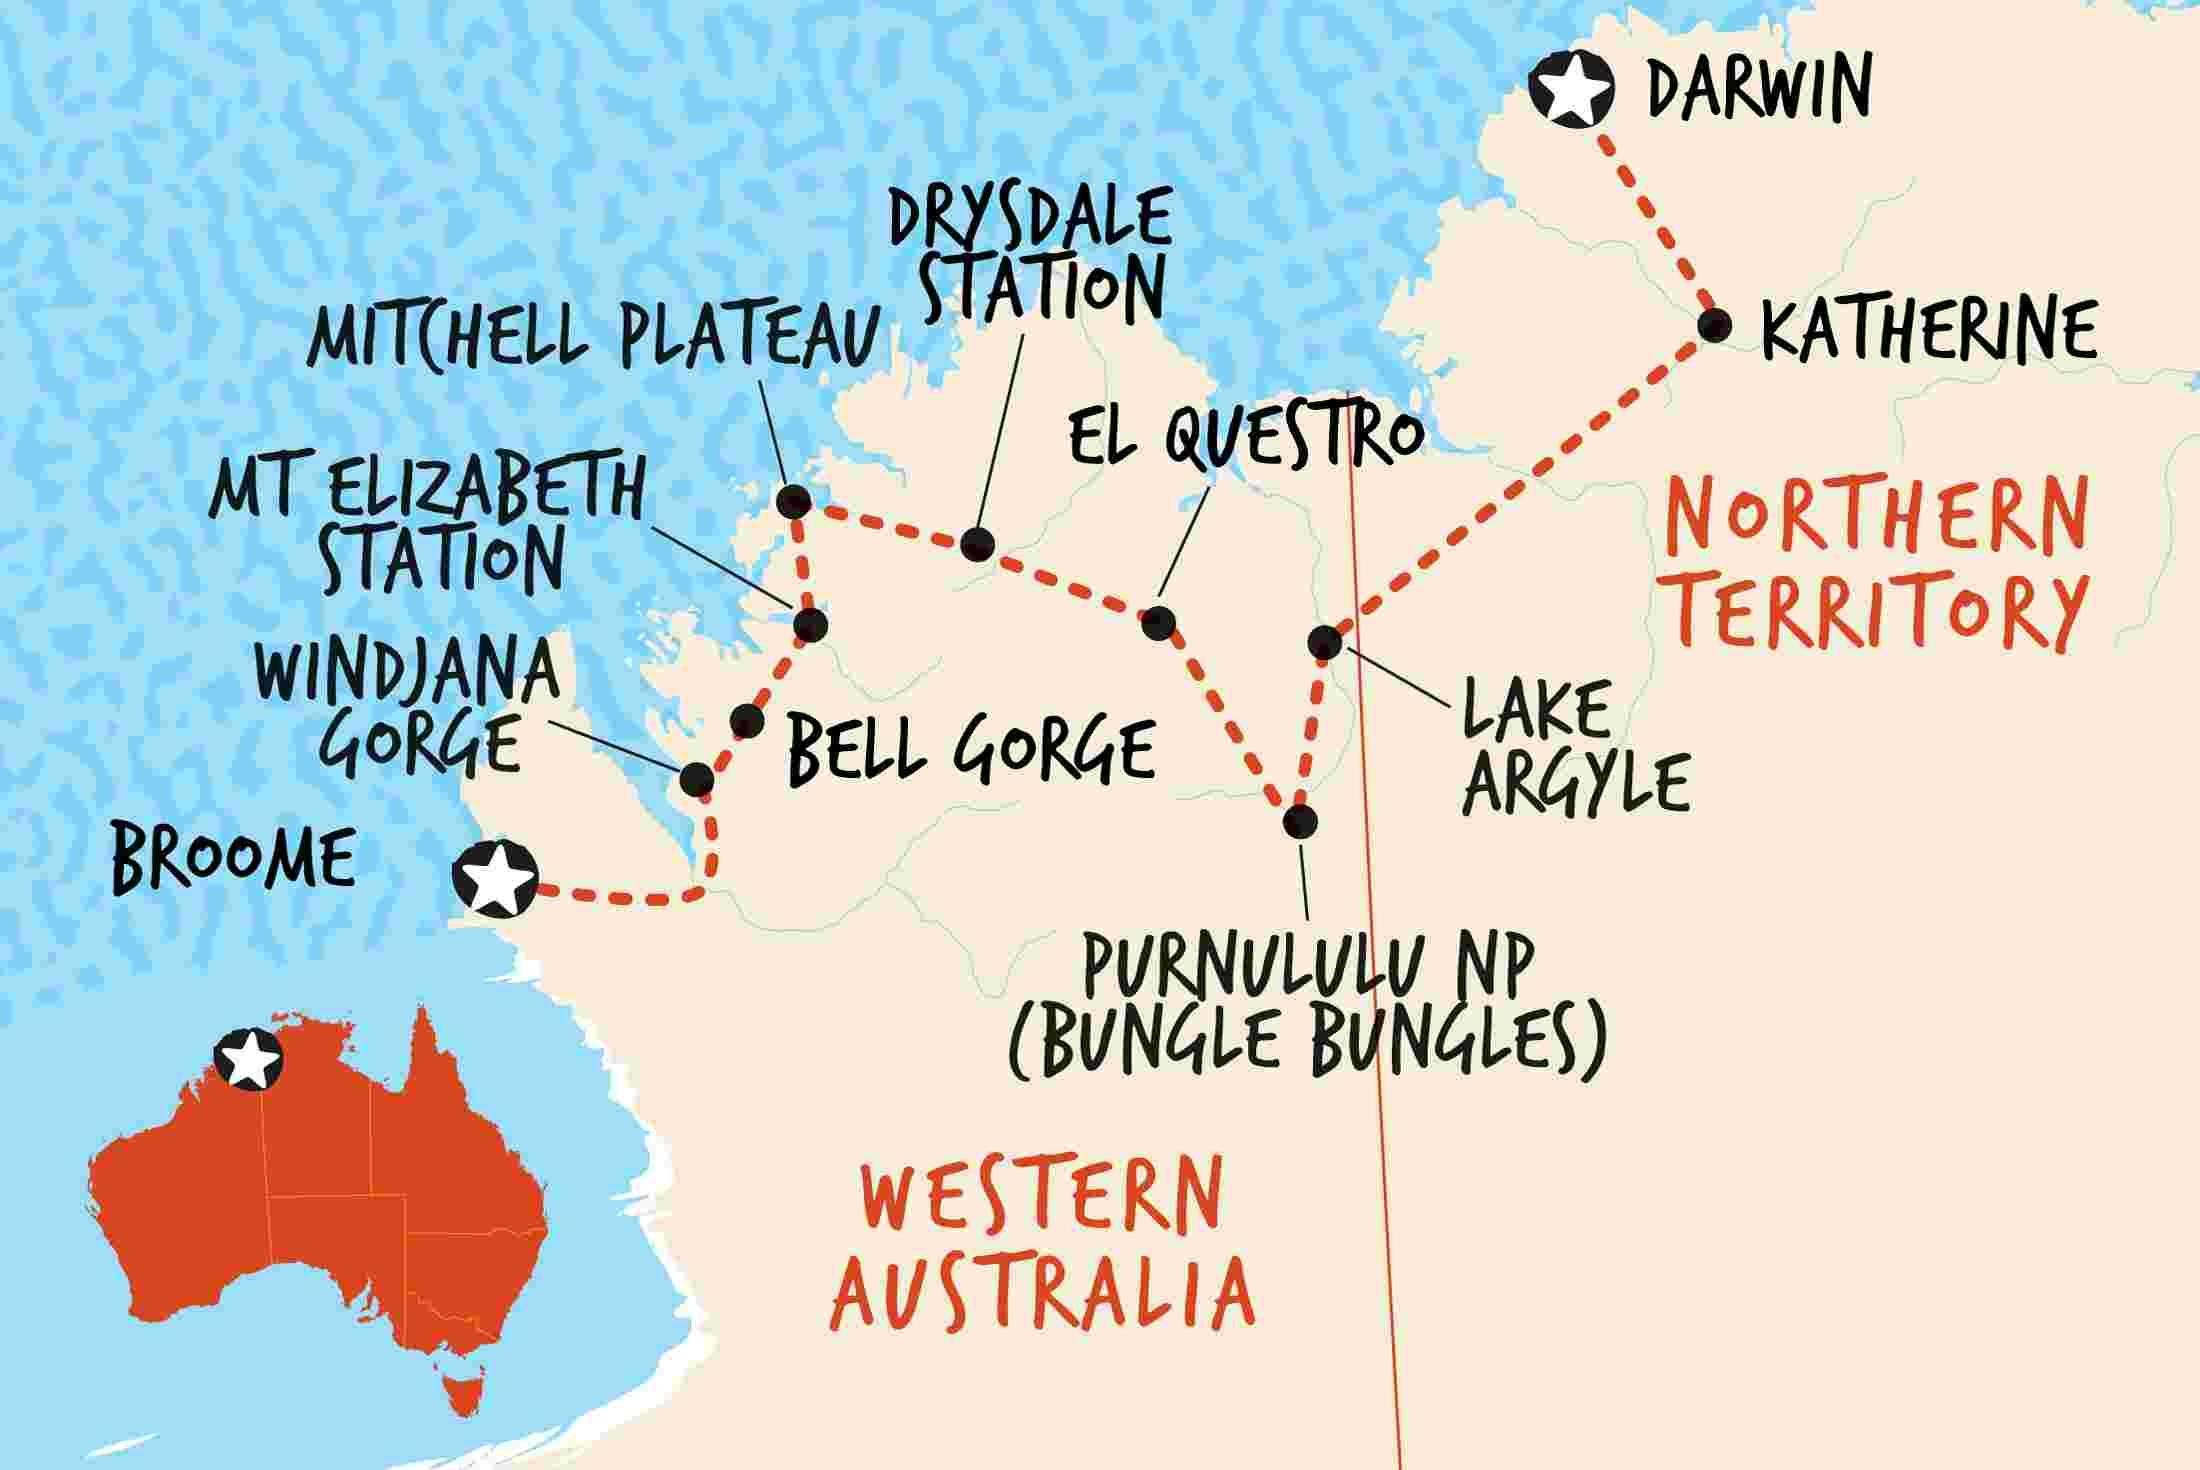 Australia Map Darwin.Kimberley Trail Darwin To Broome Overview Kimberley Trail Darwin To Broome